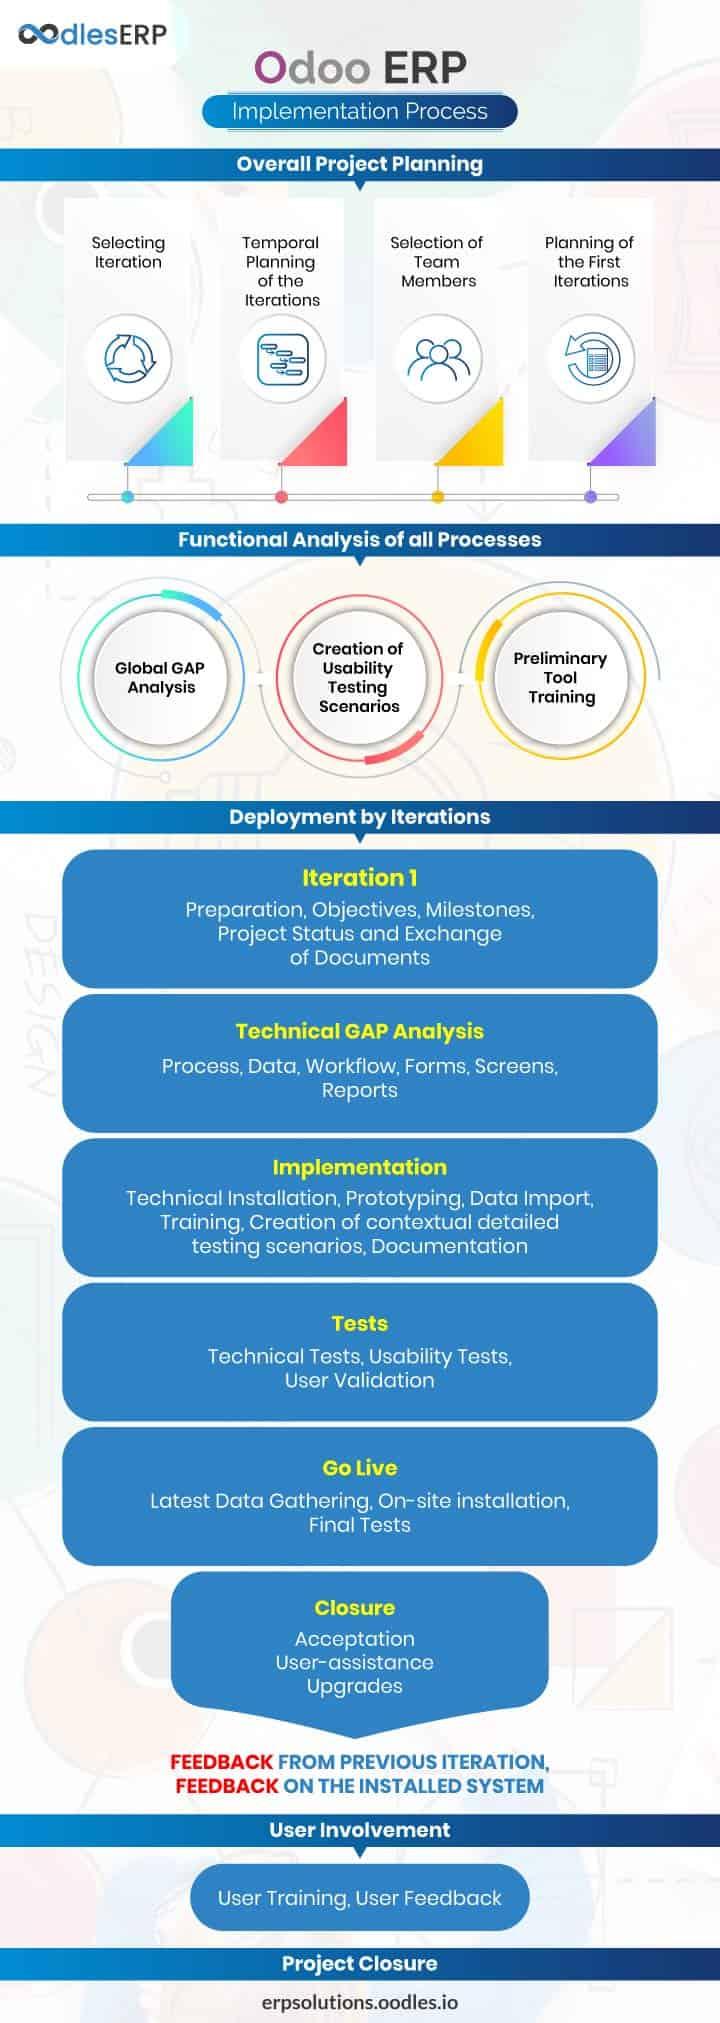 Odoo ERP Implementation